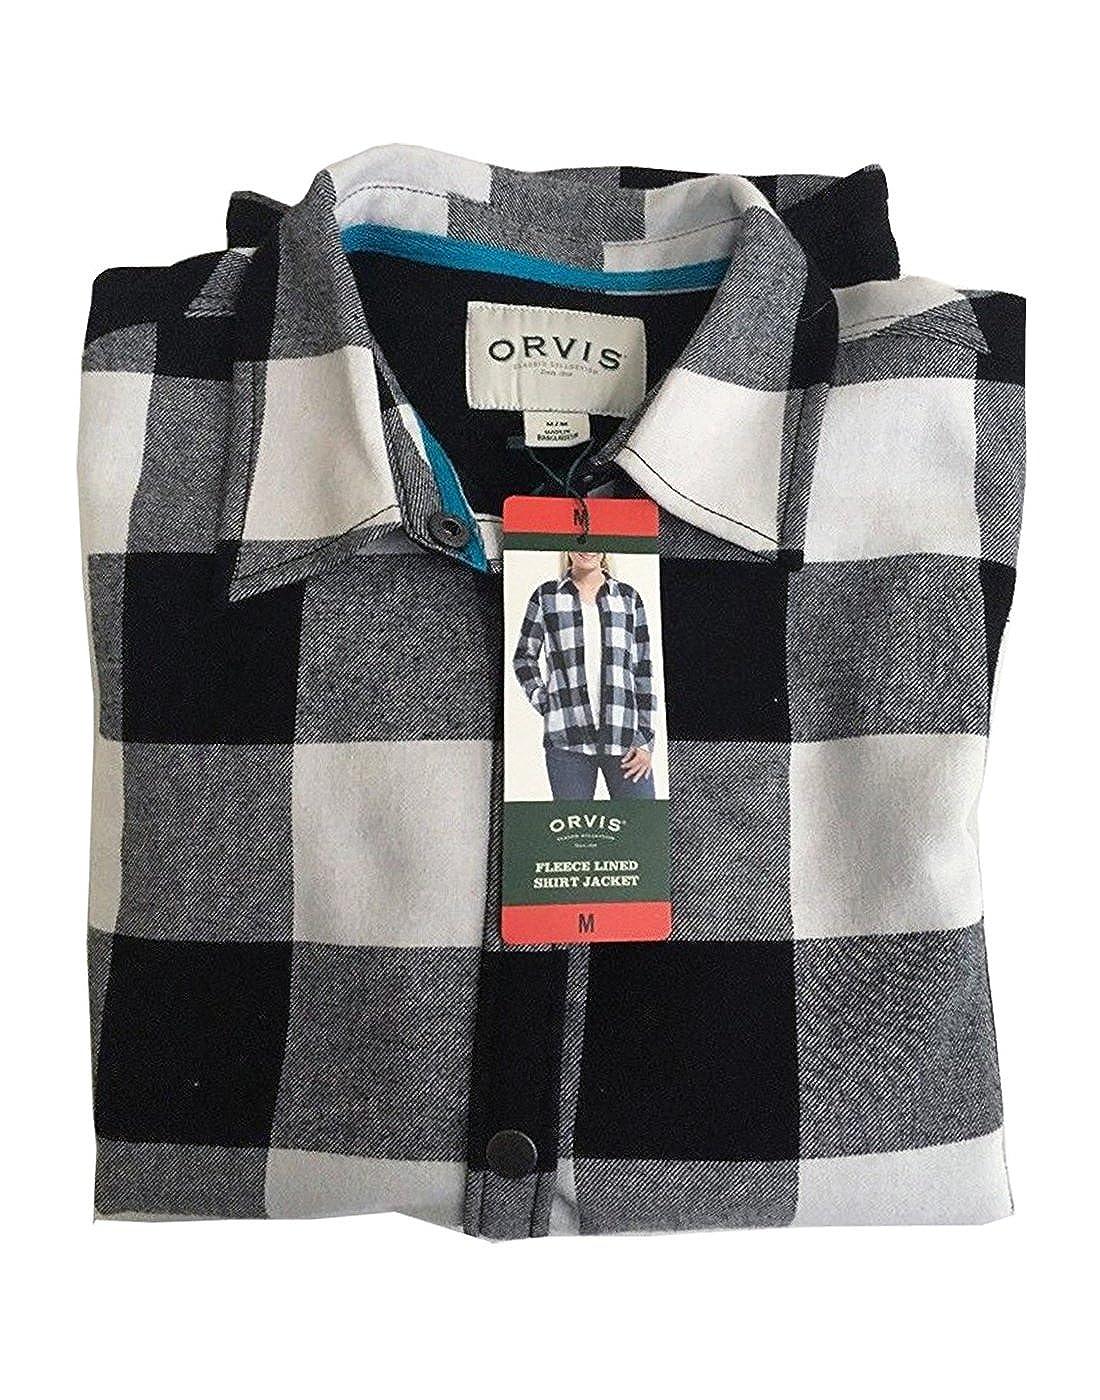 7c1cc1805a5 Orvis Womens Fleece Lined Flannel Shirt Jacket - Multicoloured - Medium   Amazon.co.uk  Clothing